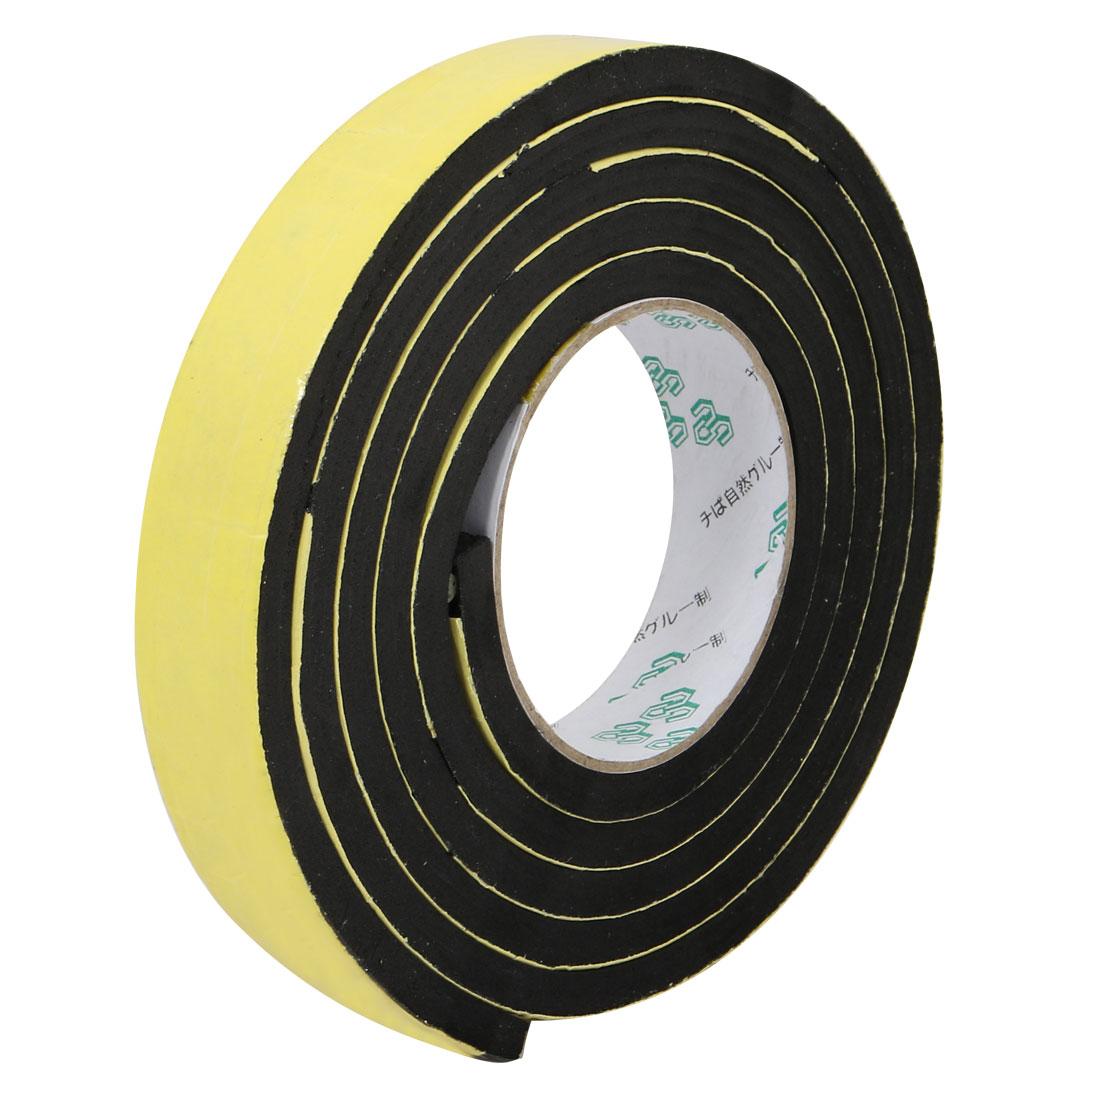 25mm Wide 8mm Thick Single Sided Shockproof EVA Sponge Tape Black 2 Meters Long